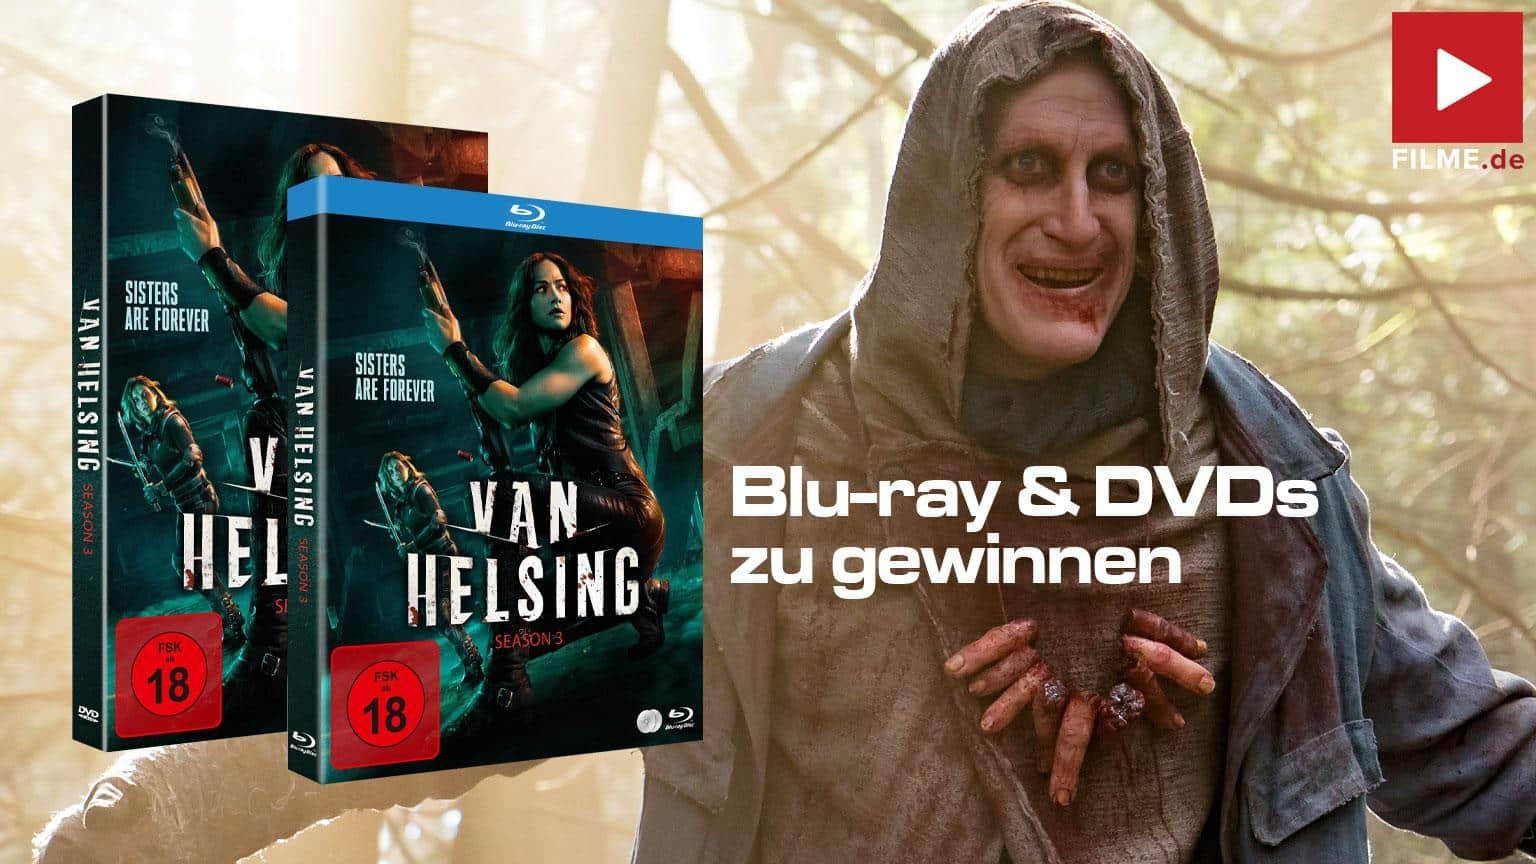 Van Helsing Staffel 3 Gewinnspiel gewinnen Blu-ray DVD shop kaufen Artikelbild